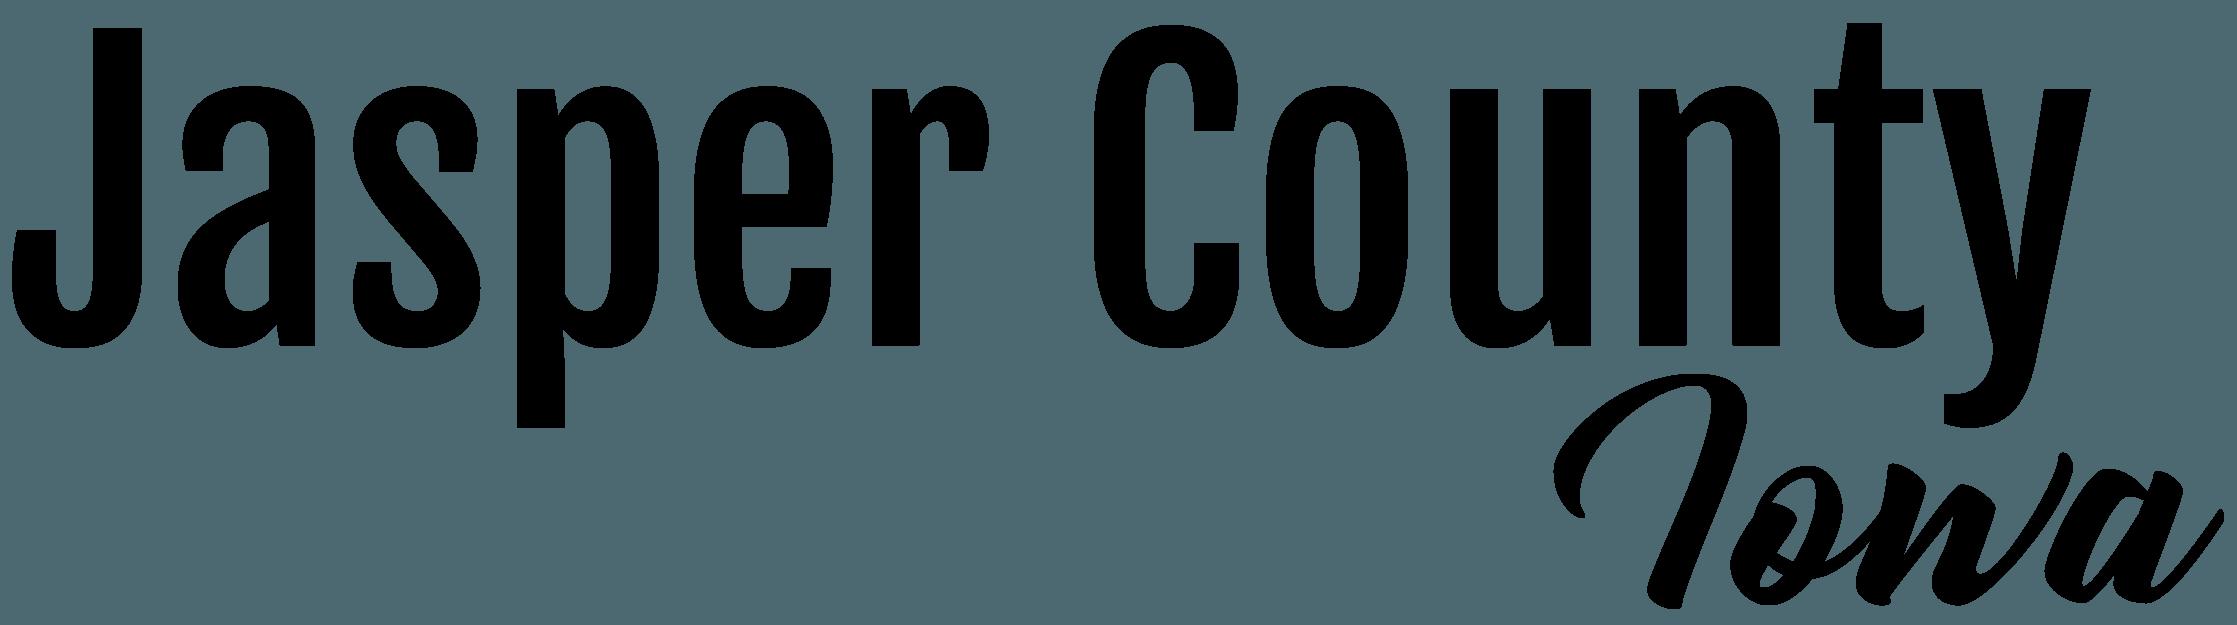 Jasper County Recorder   Jasper County, IA